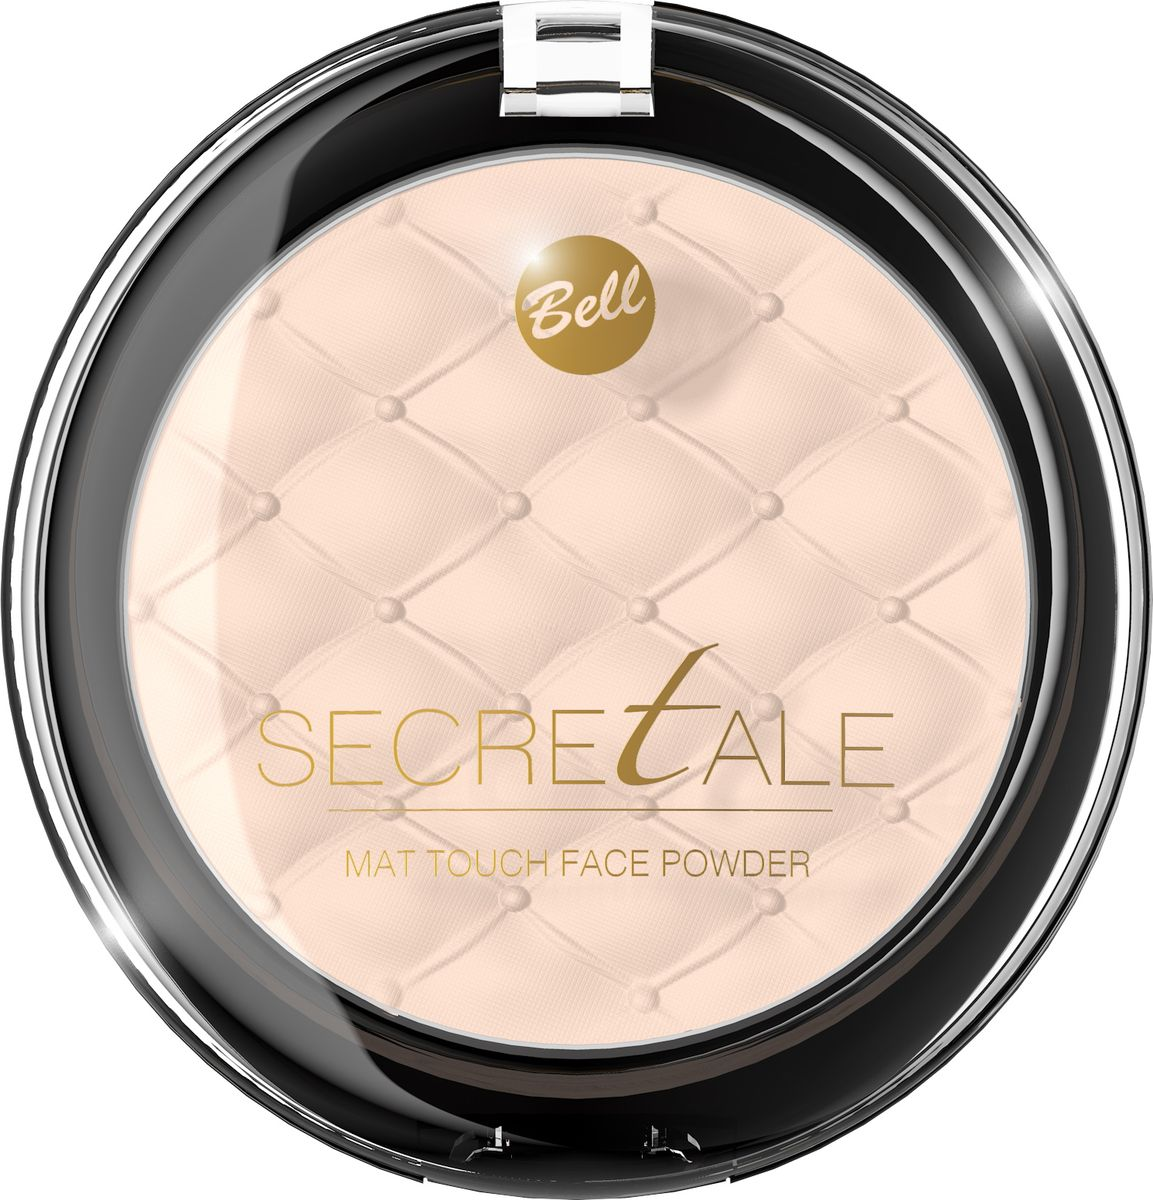 Bell Пудра Матирующая Фиксирующая Макияж Secretale Mat Touch Face Powder Тон 02